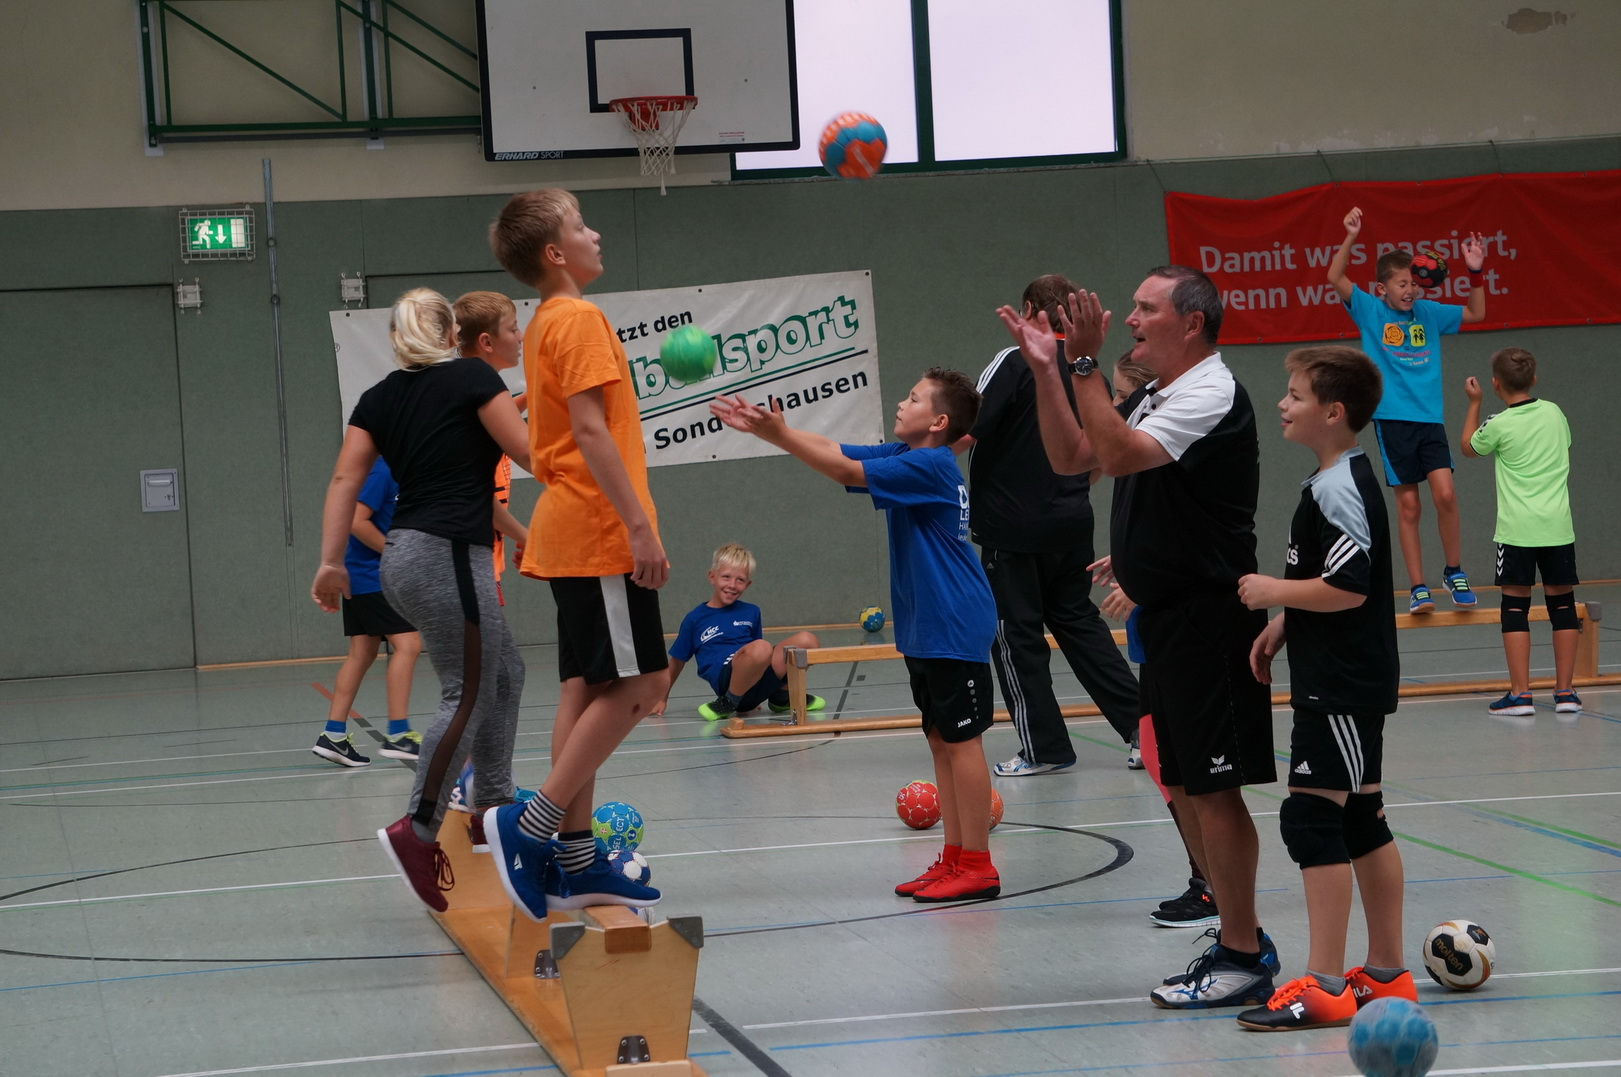 201808_Handballcamp_SDH_MG_178w